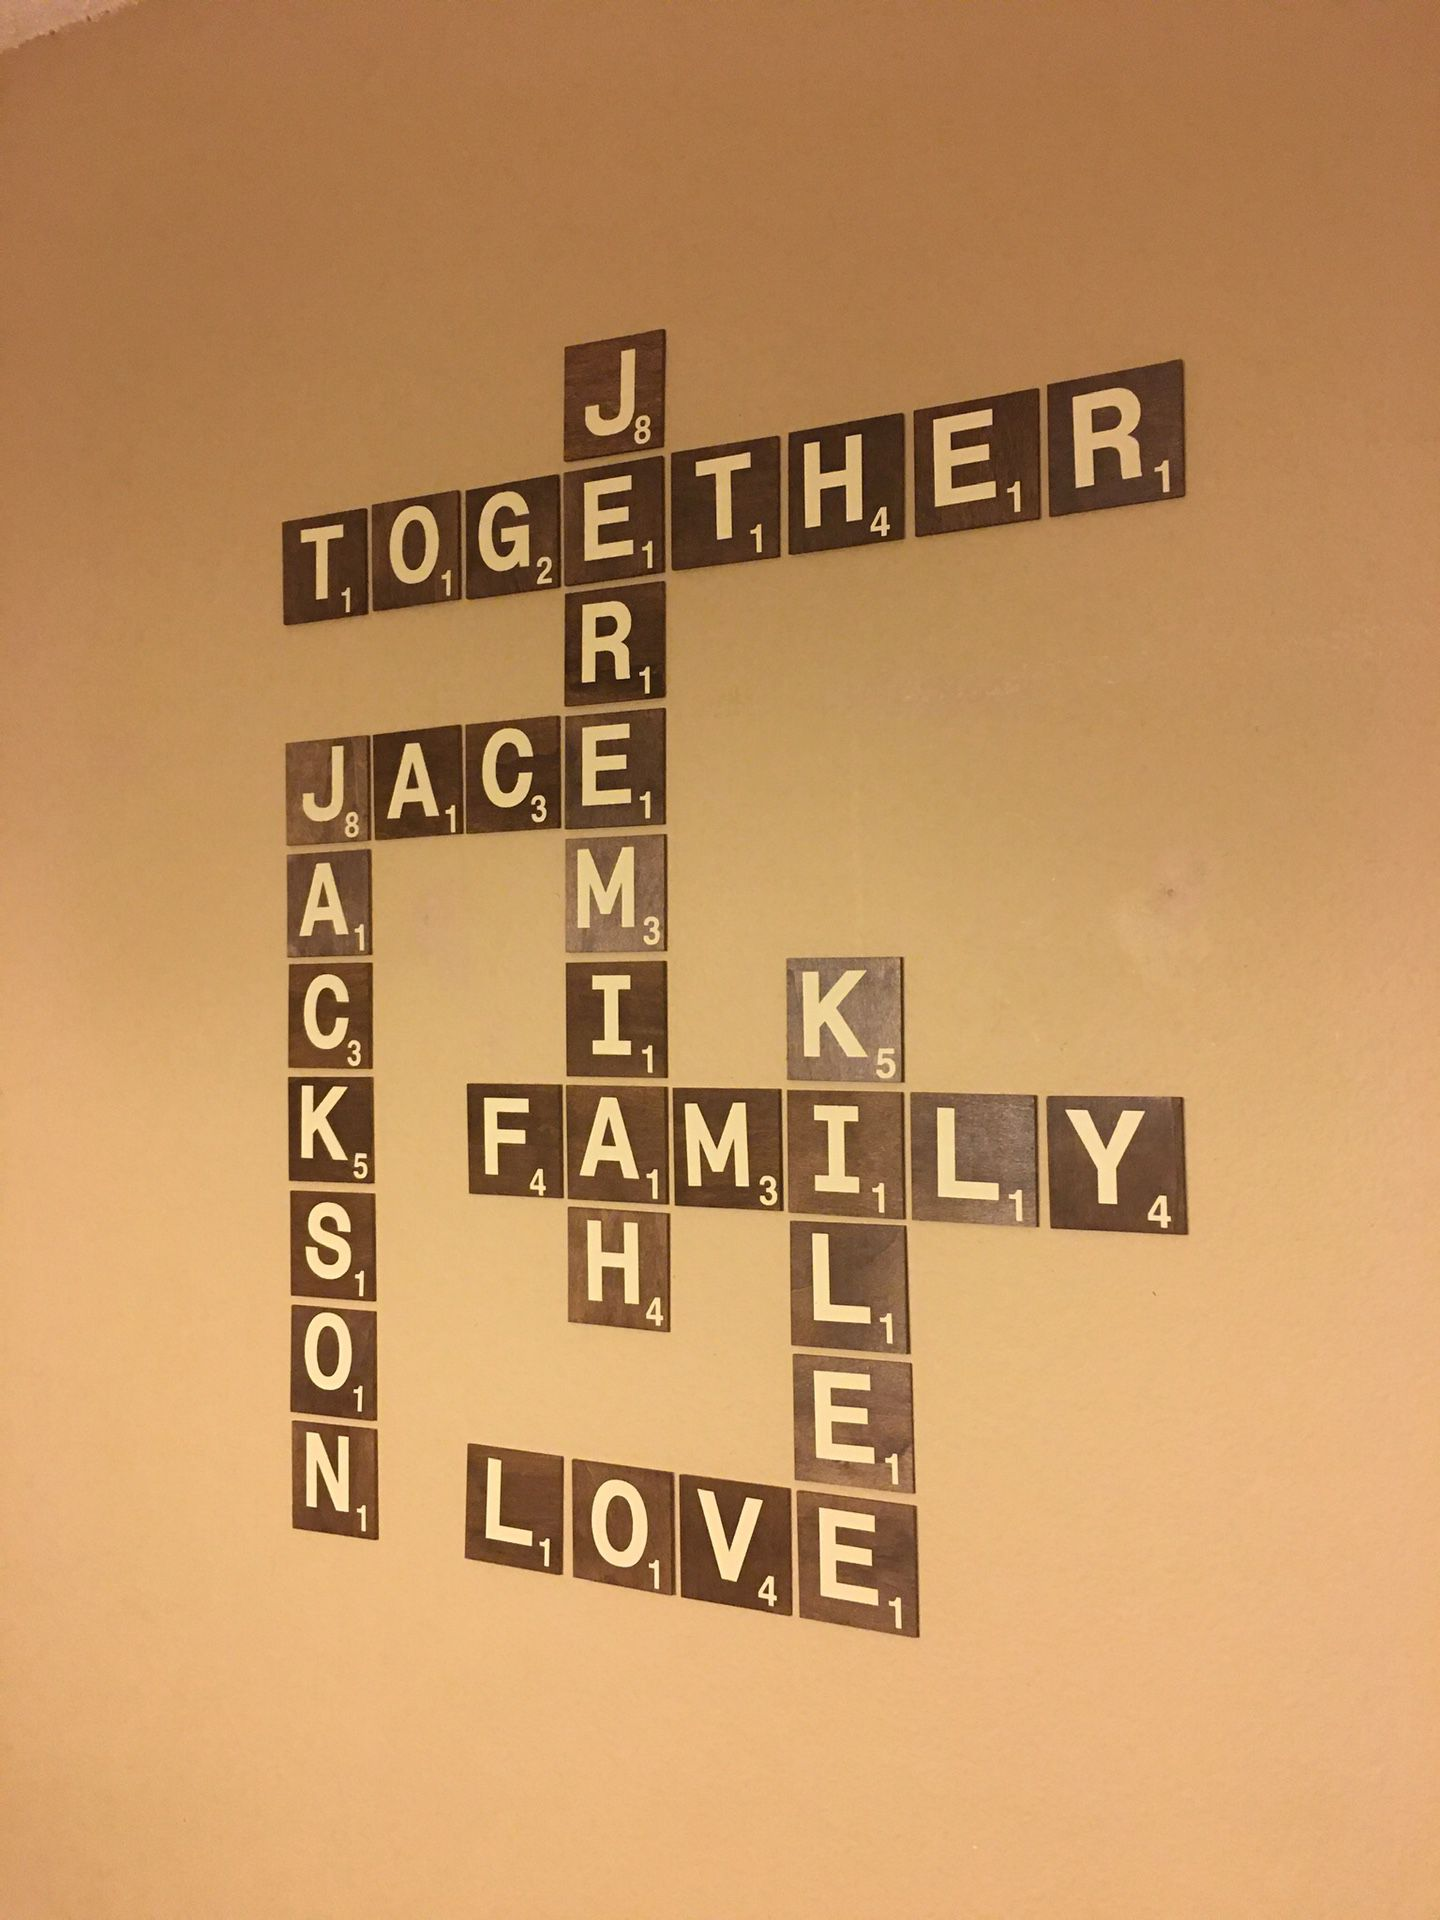 Scrabble wall art decor